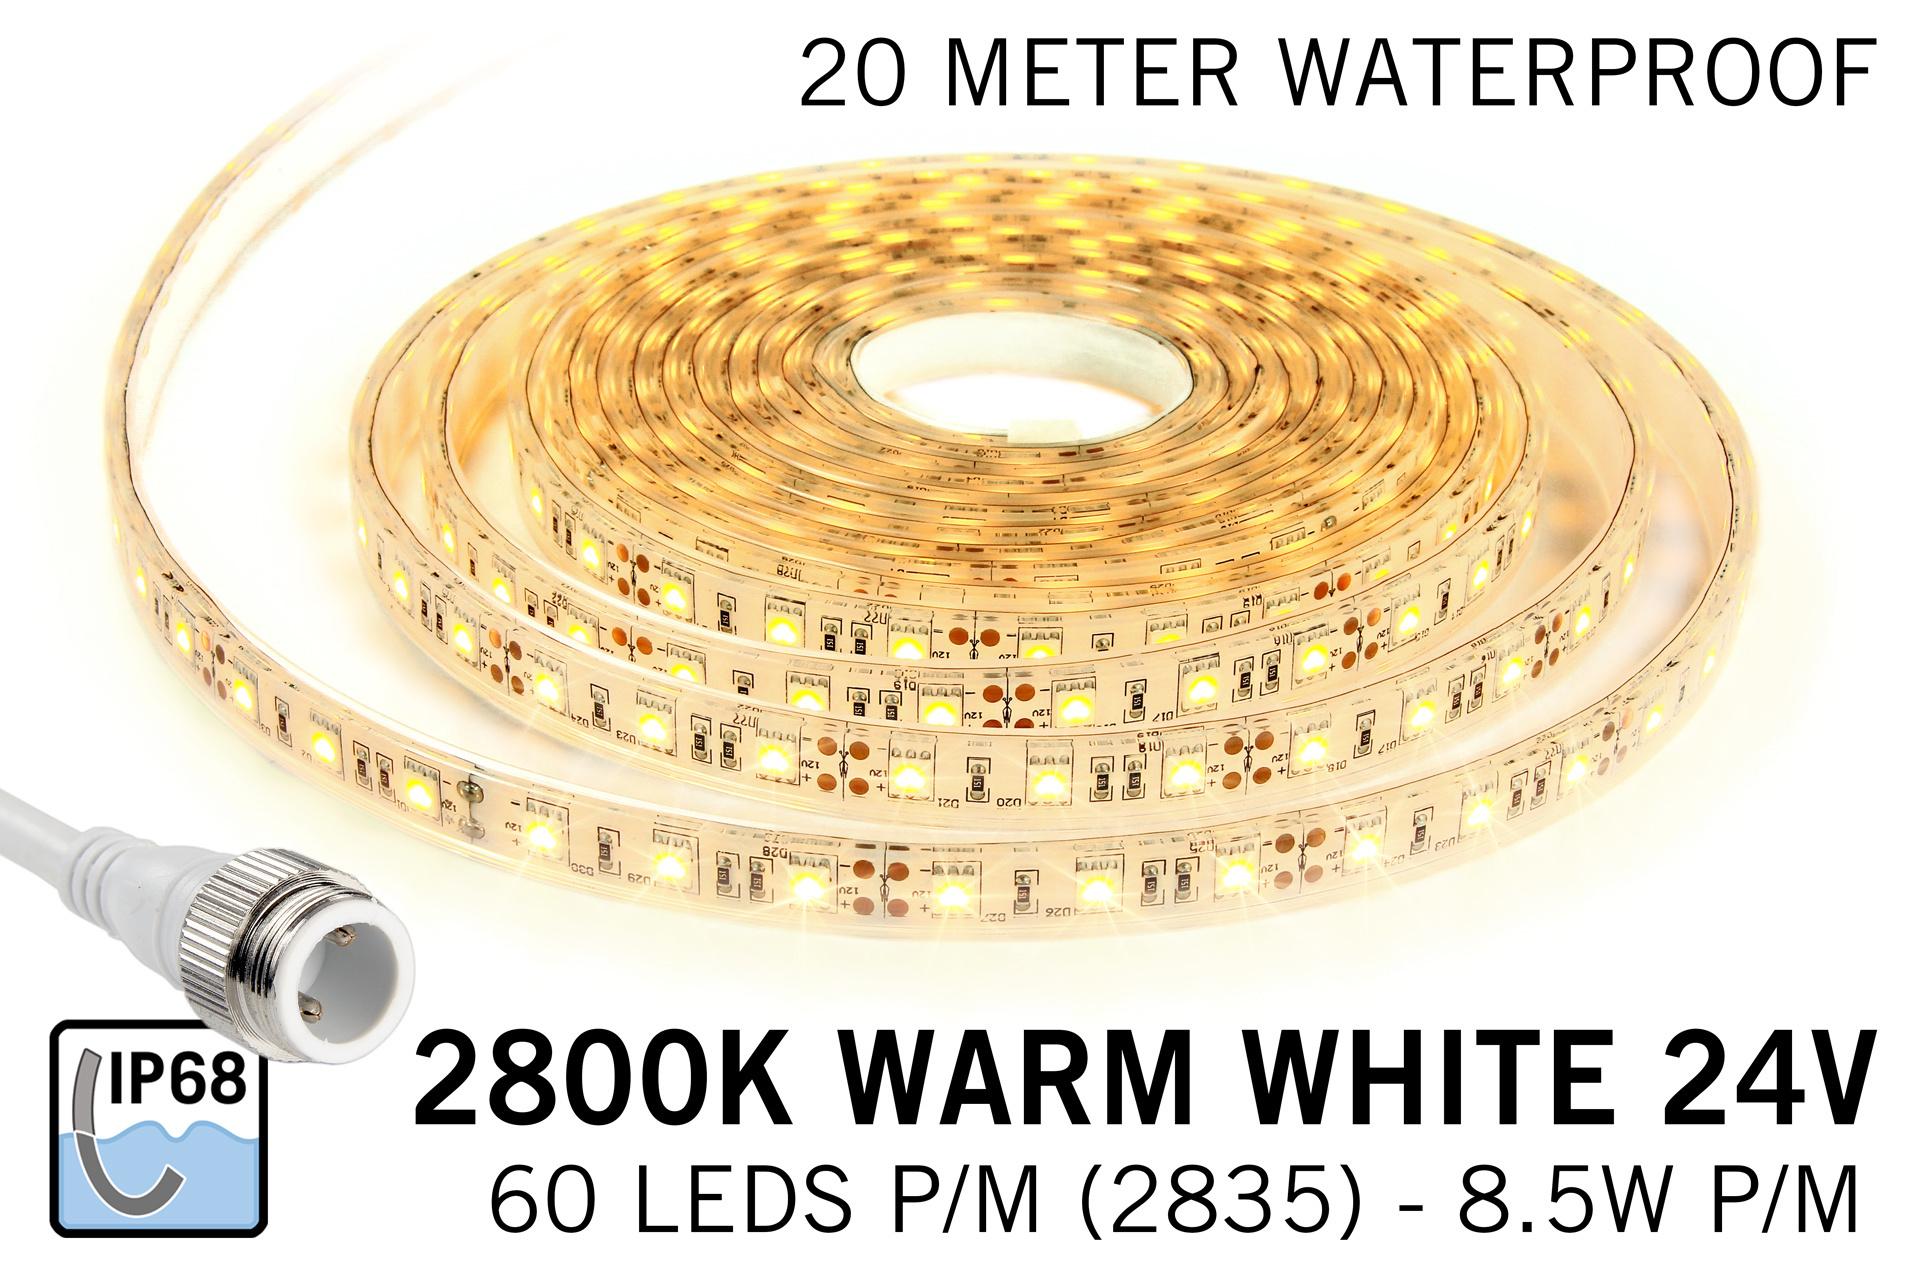 AppLamp Waterdichte Warm Witte LED strip (IP68) 60 Led's per meter 24Volt, 20  meter lengte